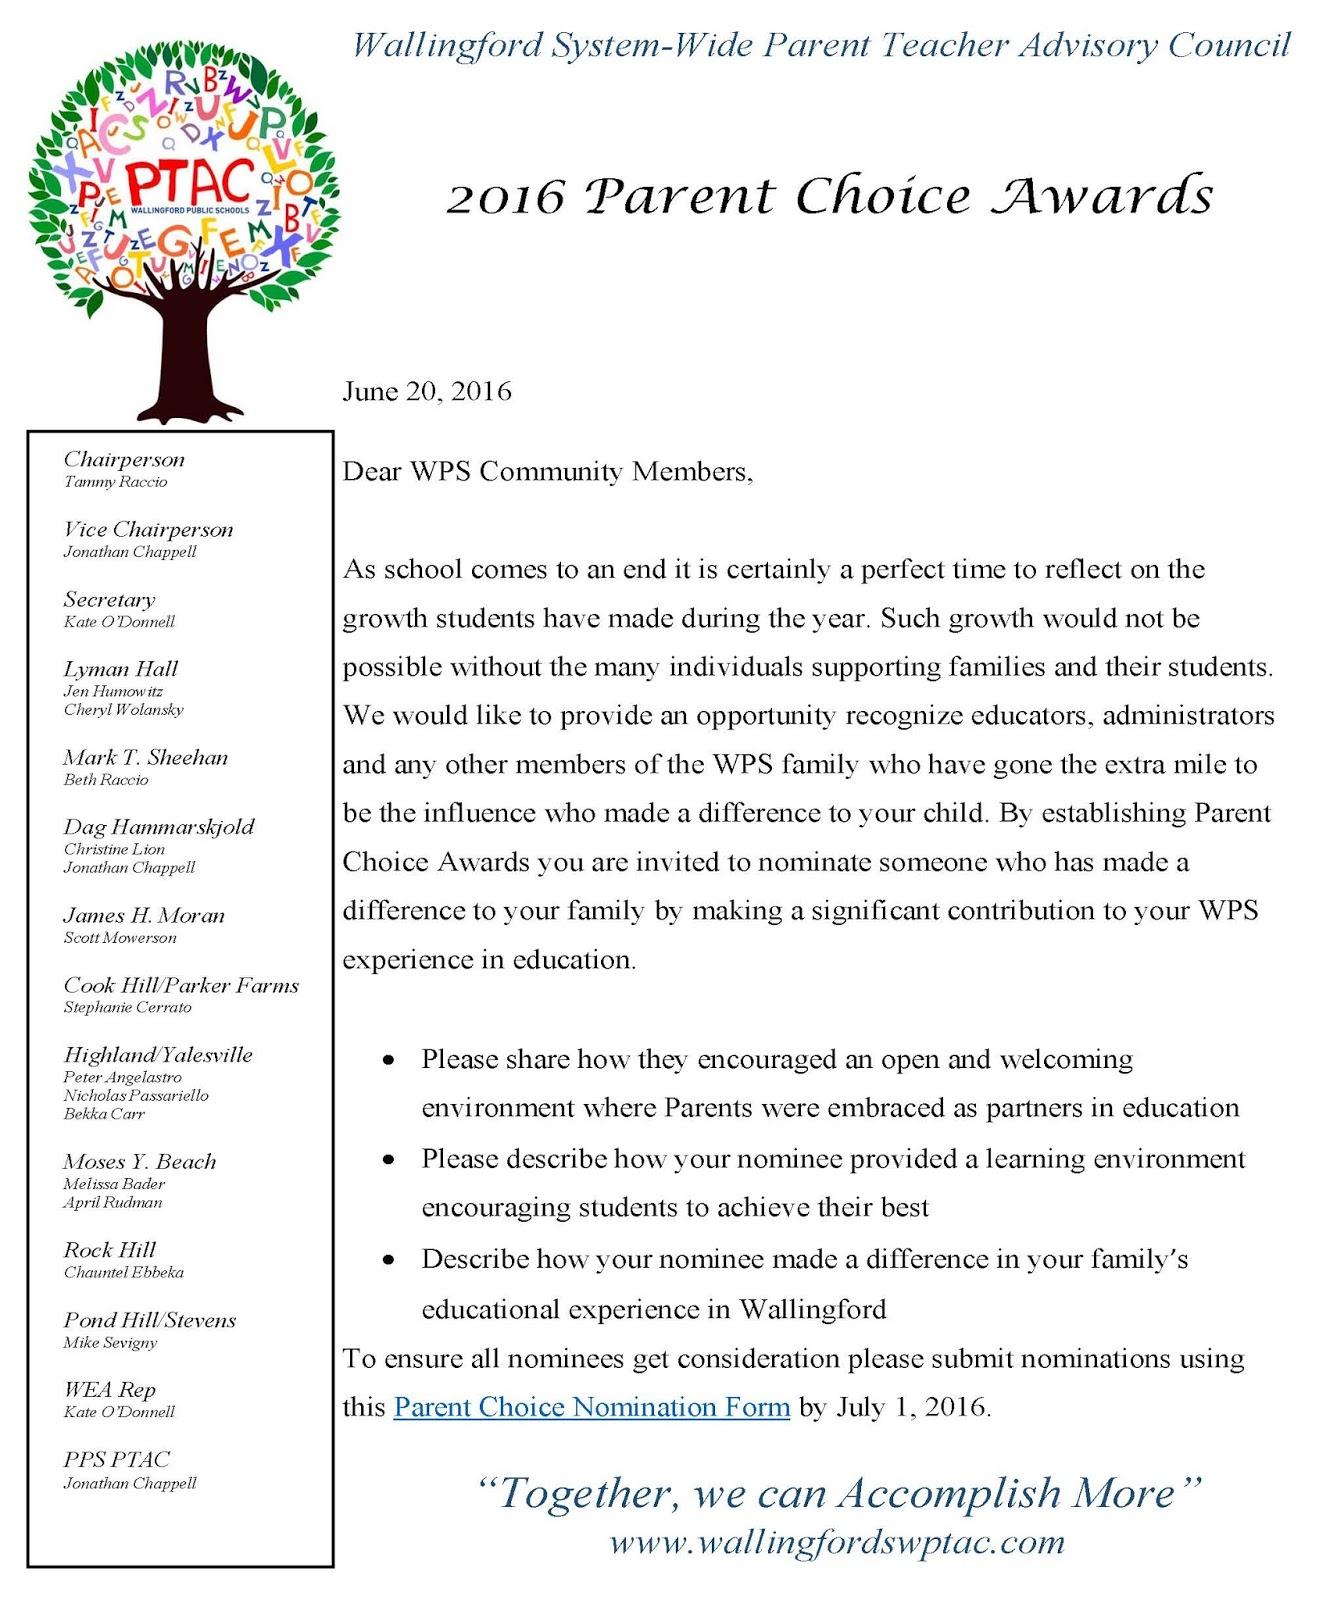 Wallingford SystemWide Parent Teacher Advisory Council June 2016